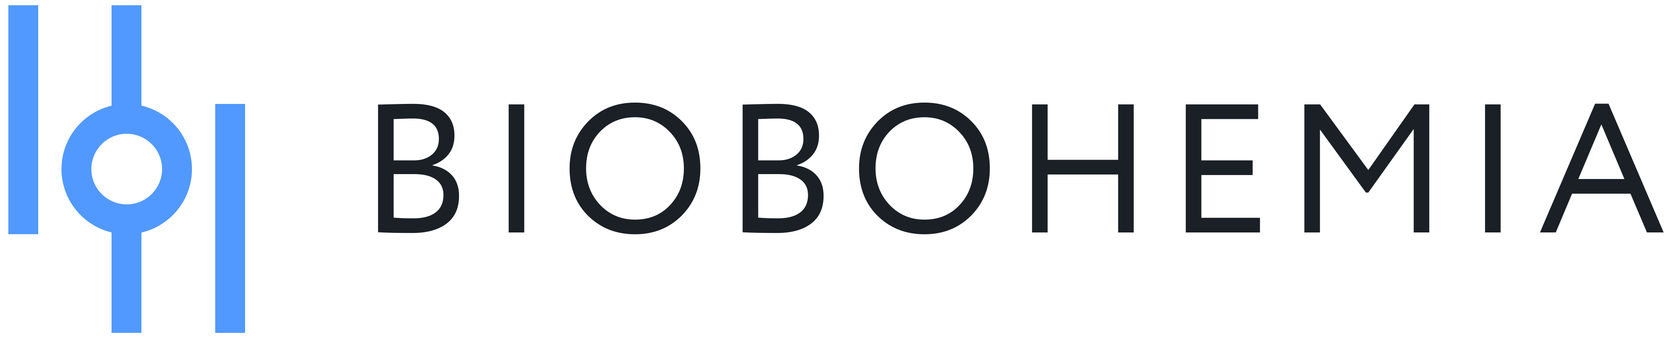 BIOBOHEMIA